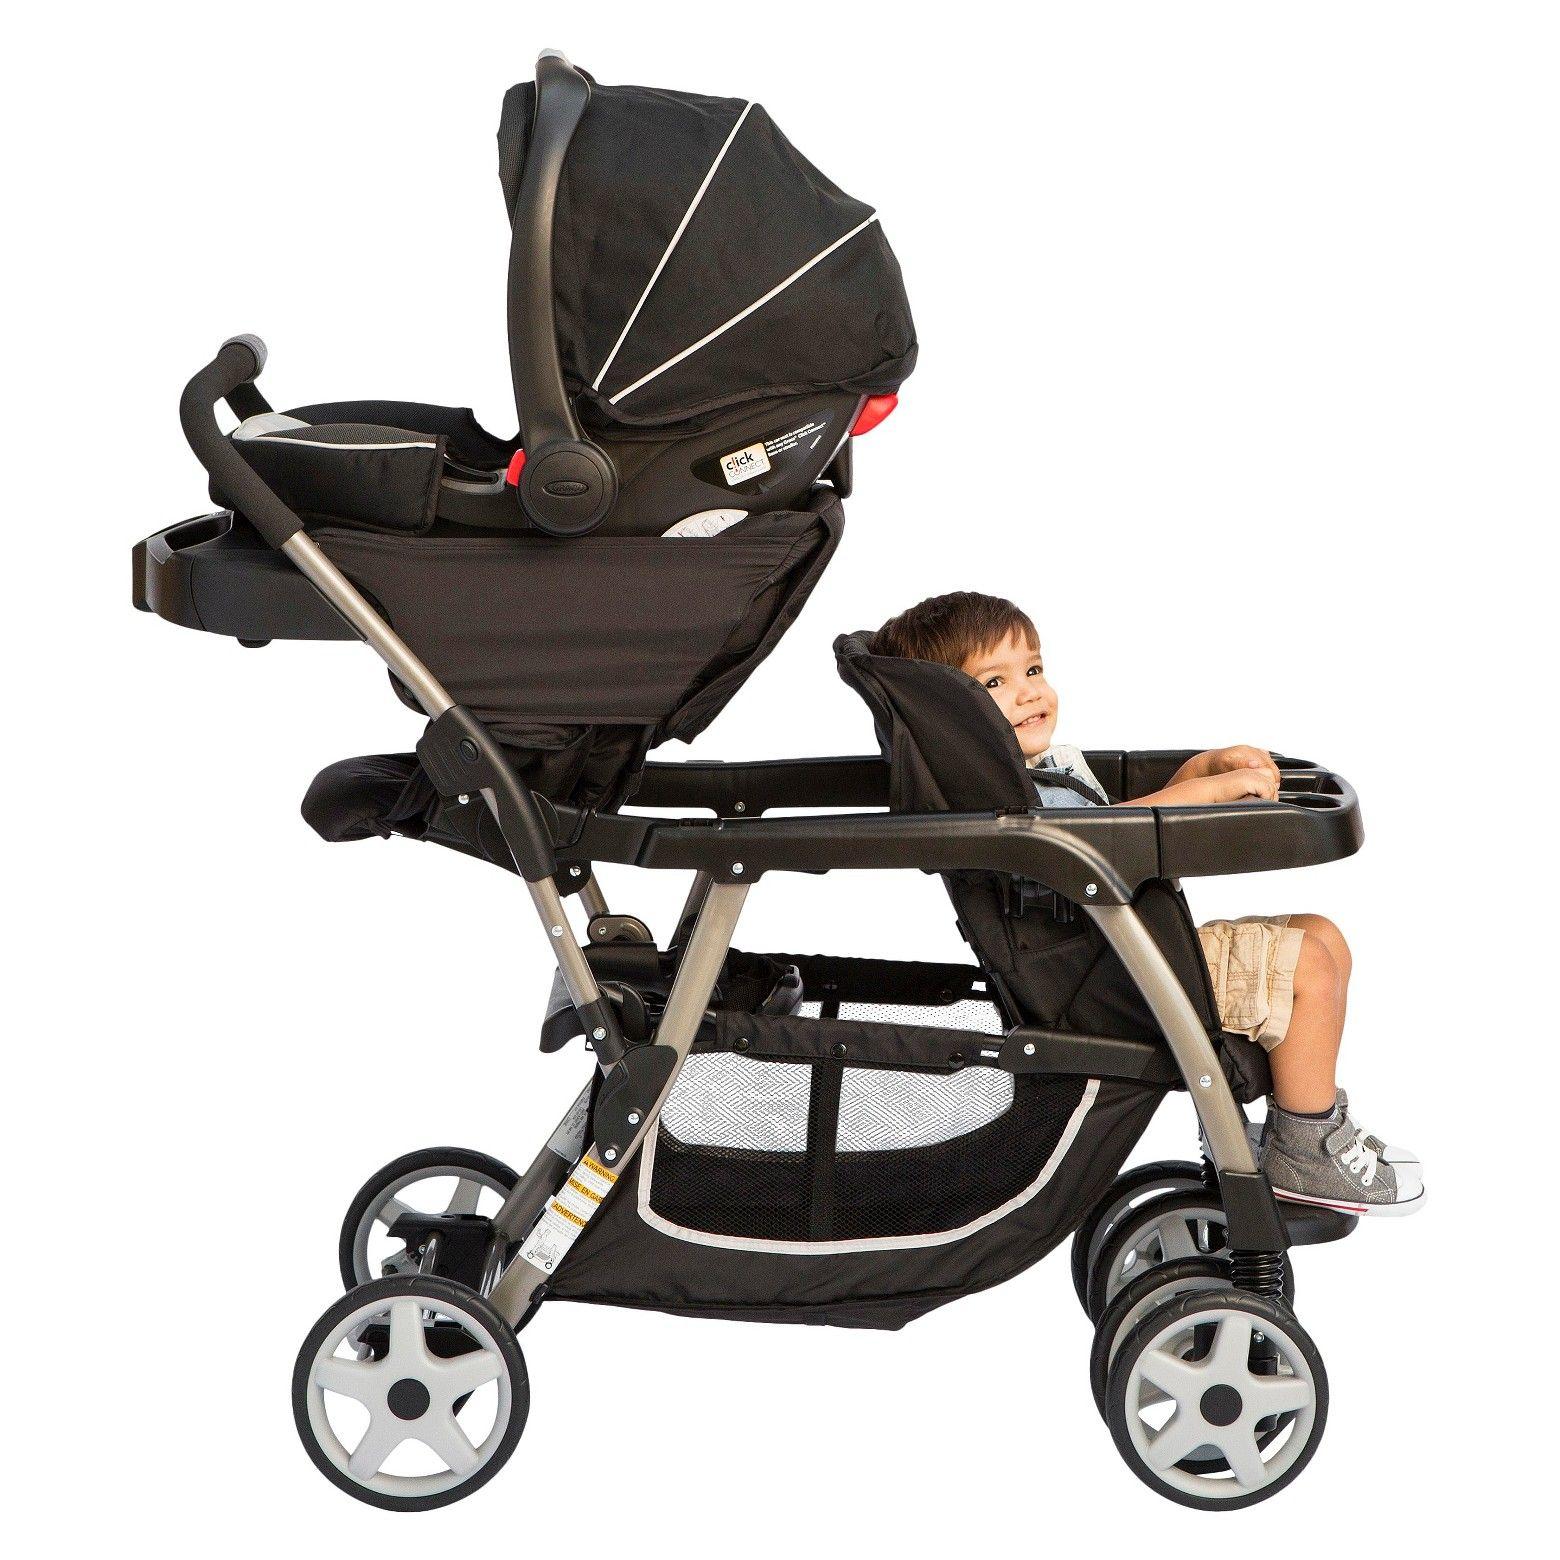 Graco Ready2Grow LX Double Stroller Baby stuff Baby